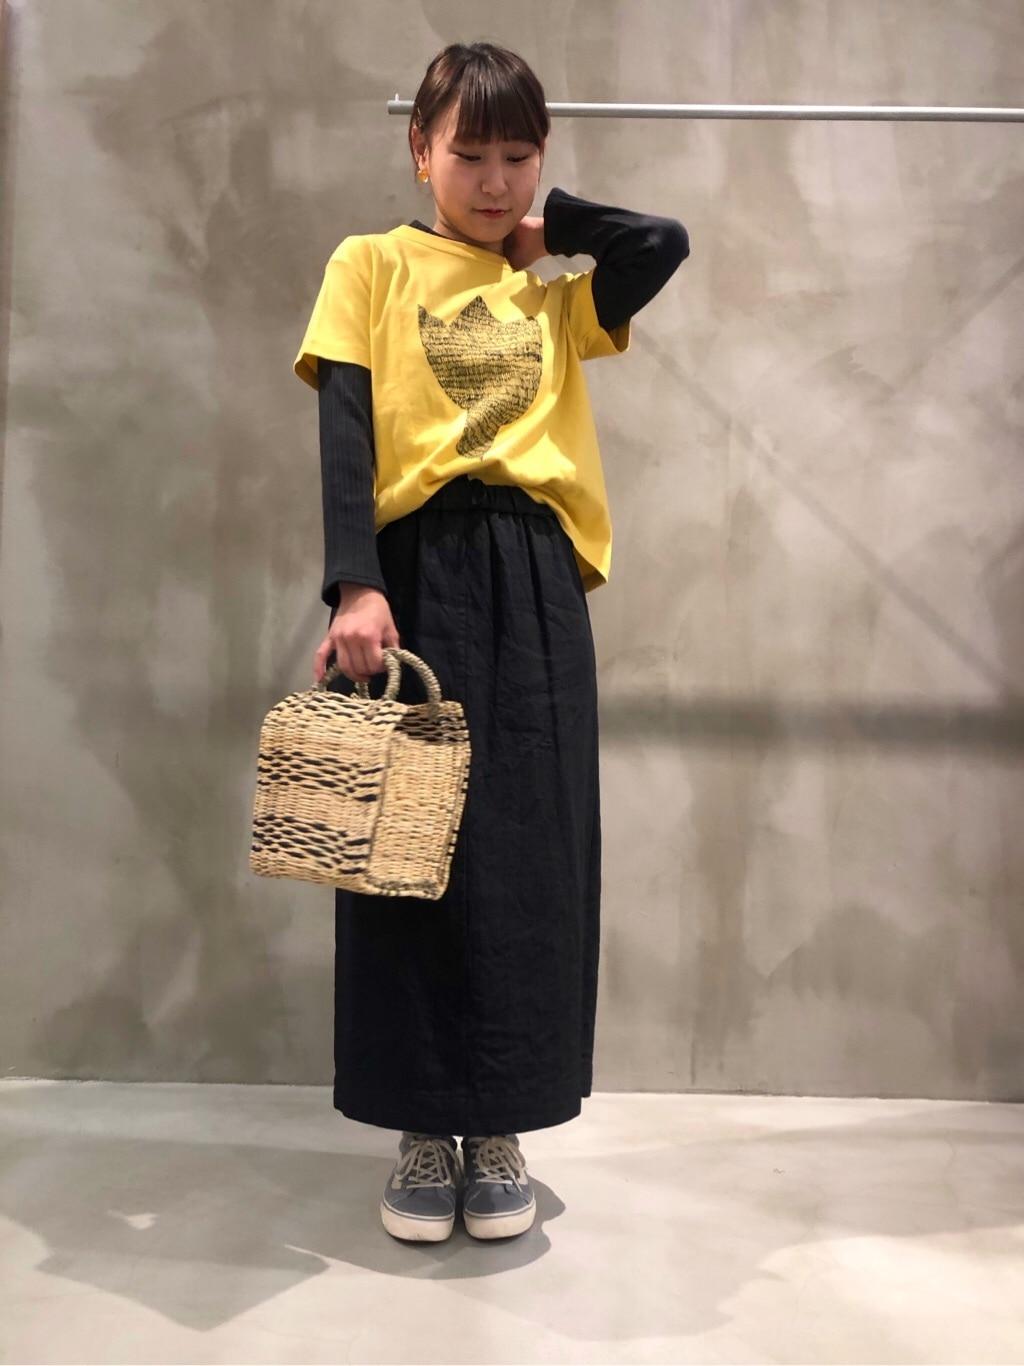 bulle de savon 渋谷スクランブルスクエア 身長:159cm 2020.03.31